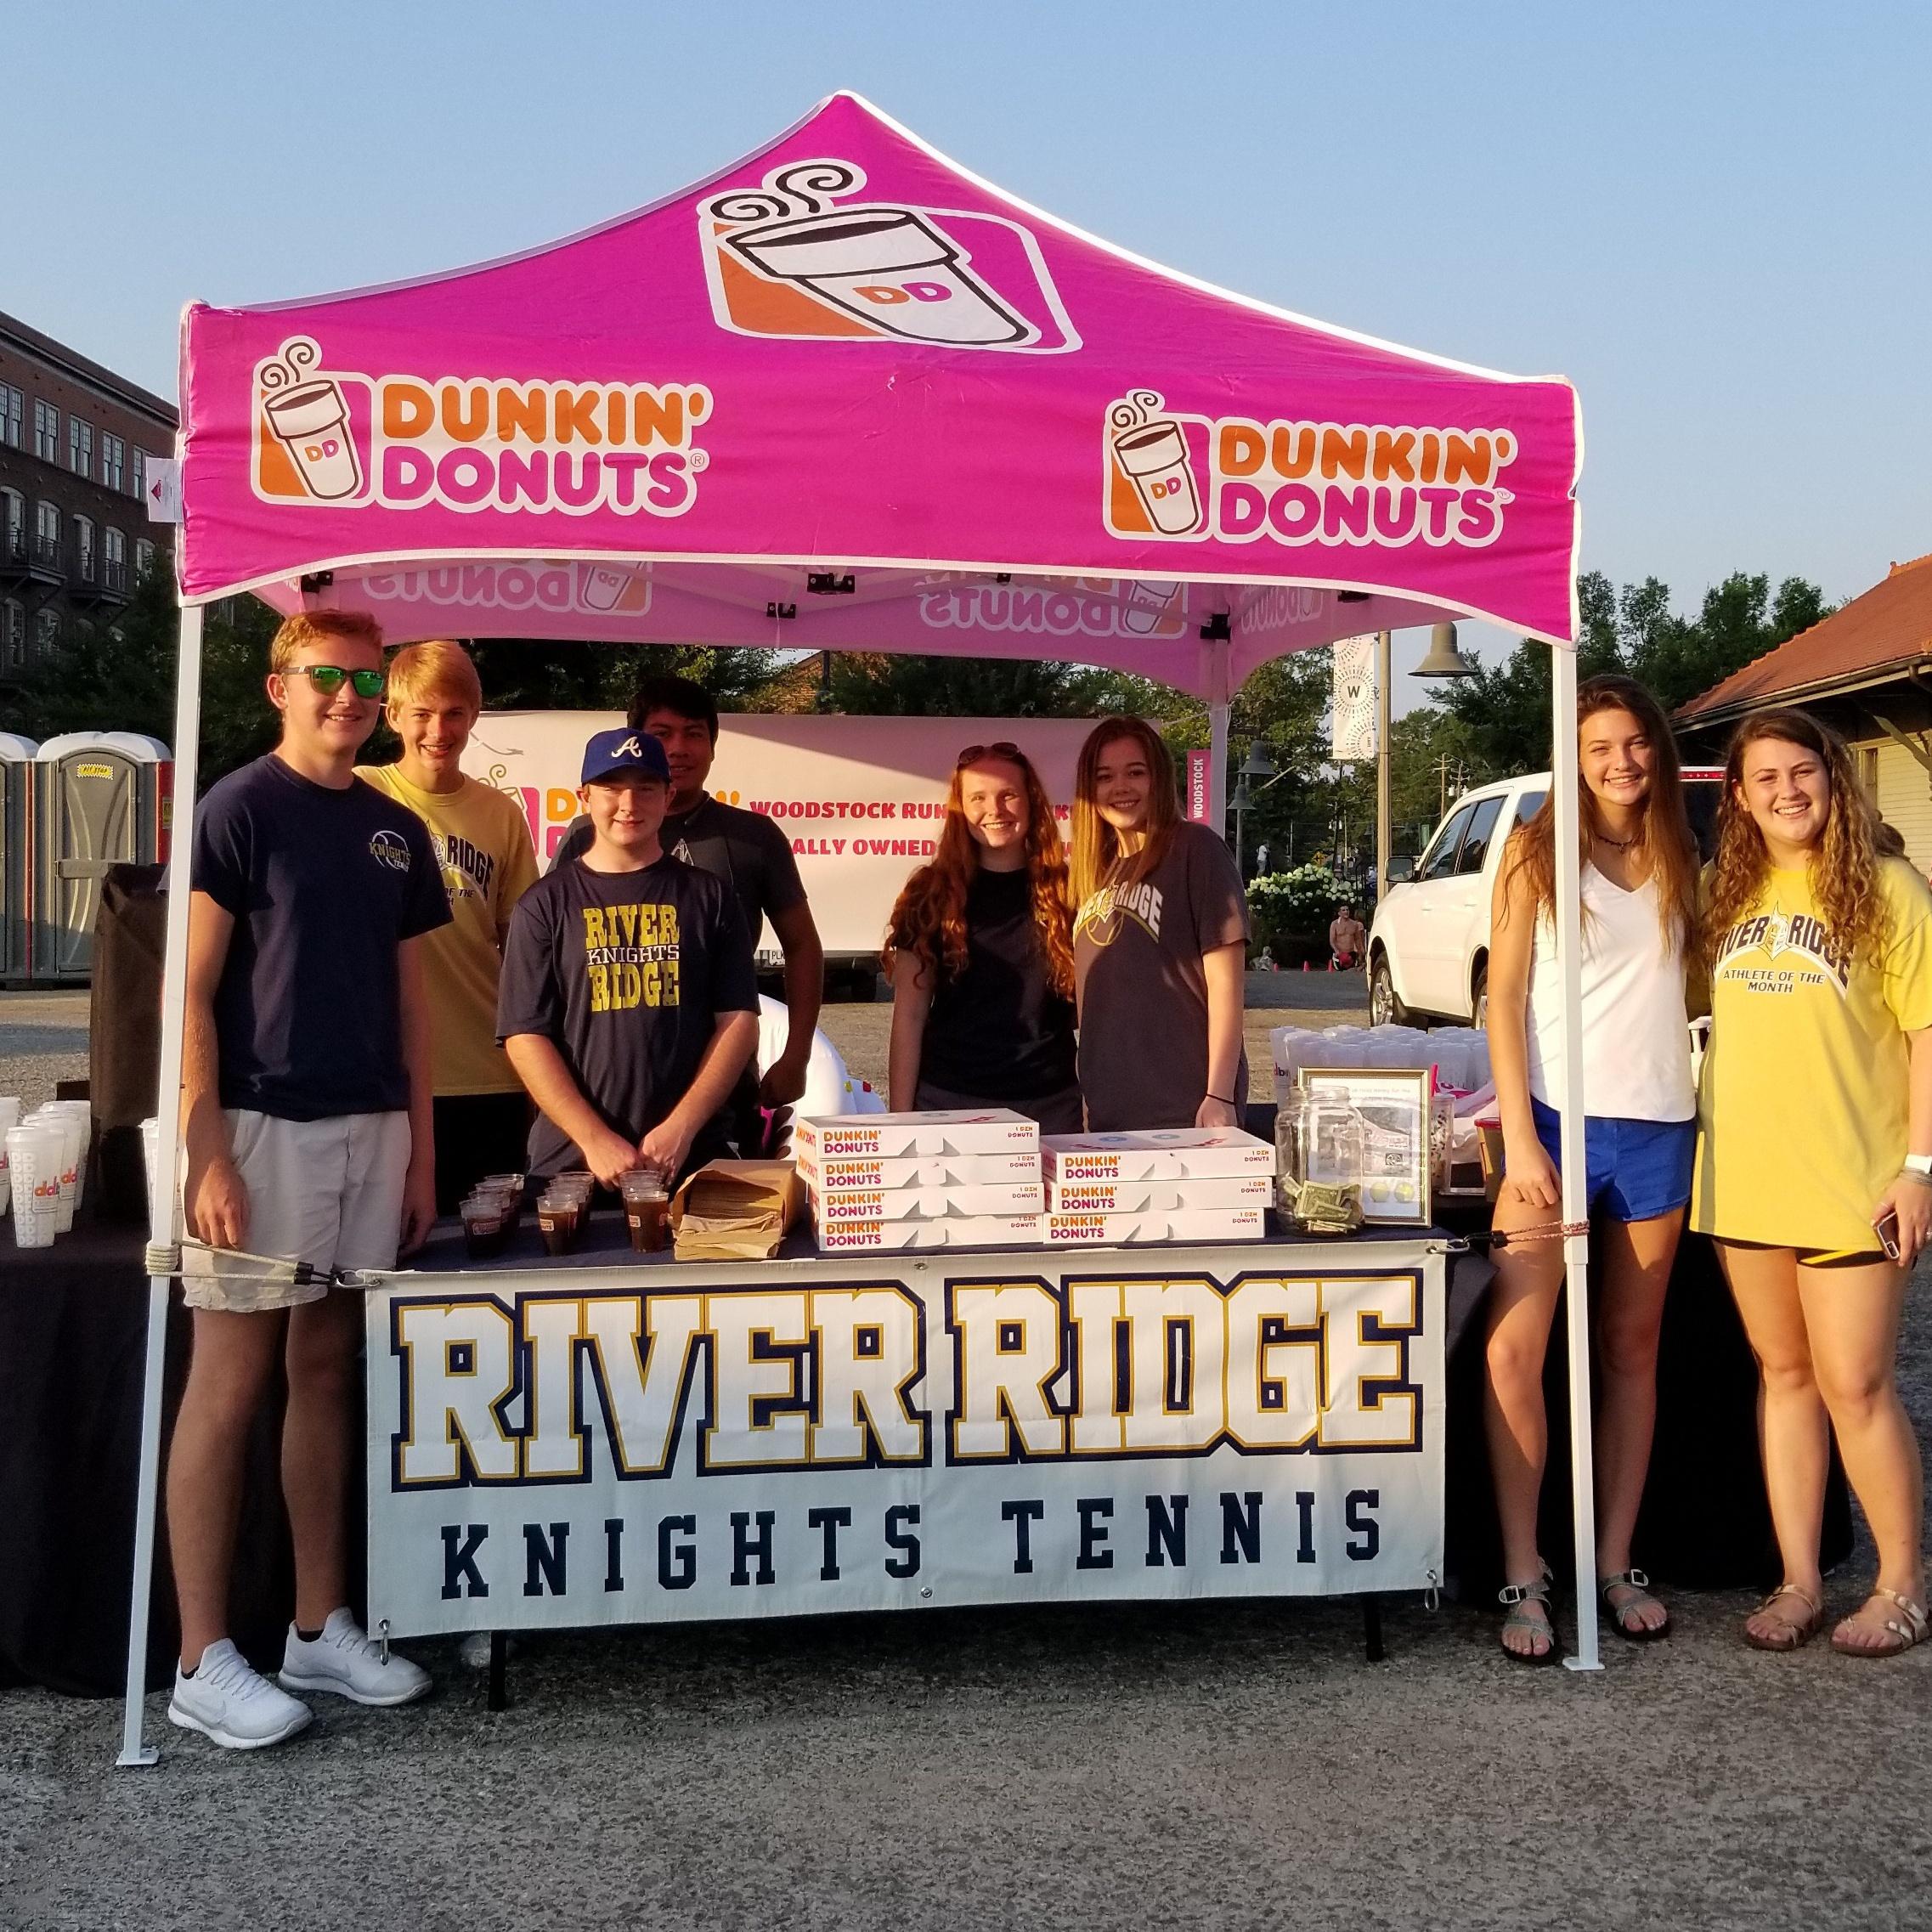 Knights Tennis Dunkin' Spirit Night Wednesday, October 17th from 4-7 p.m.